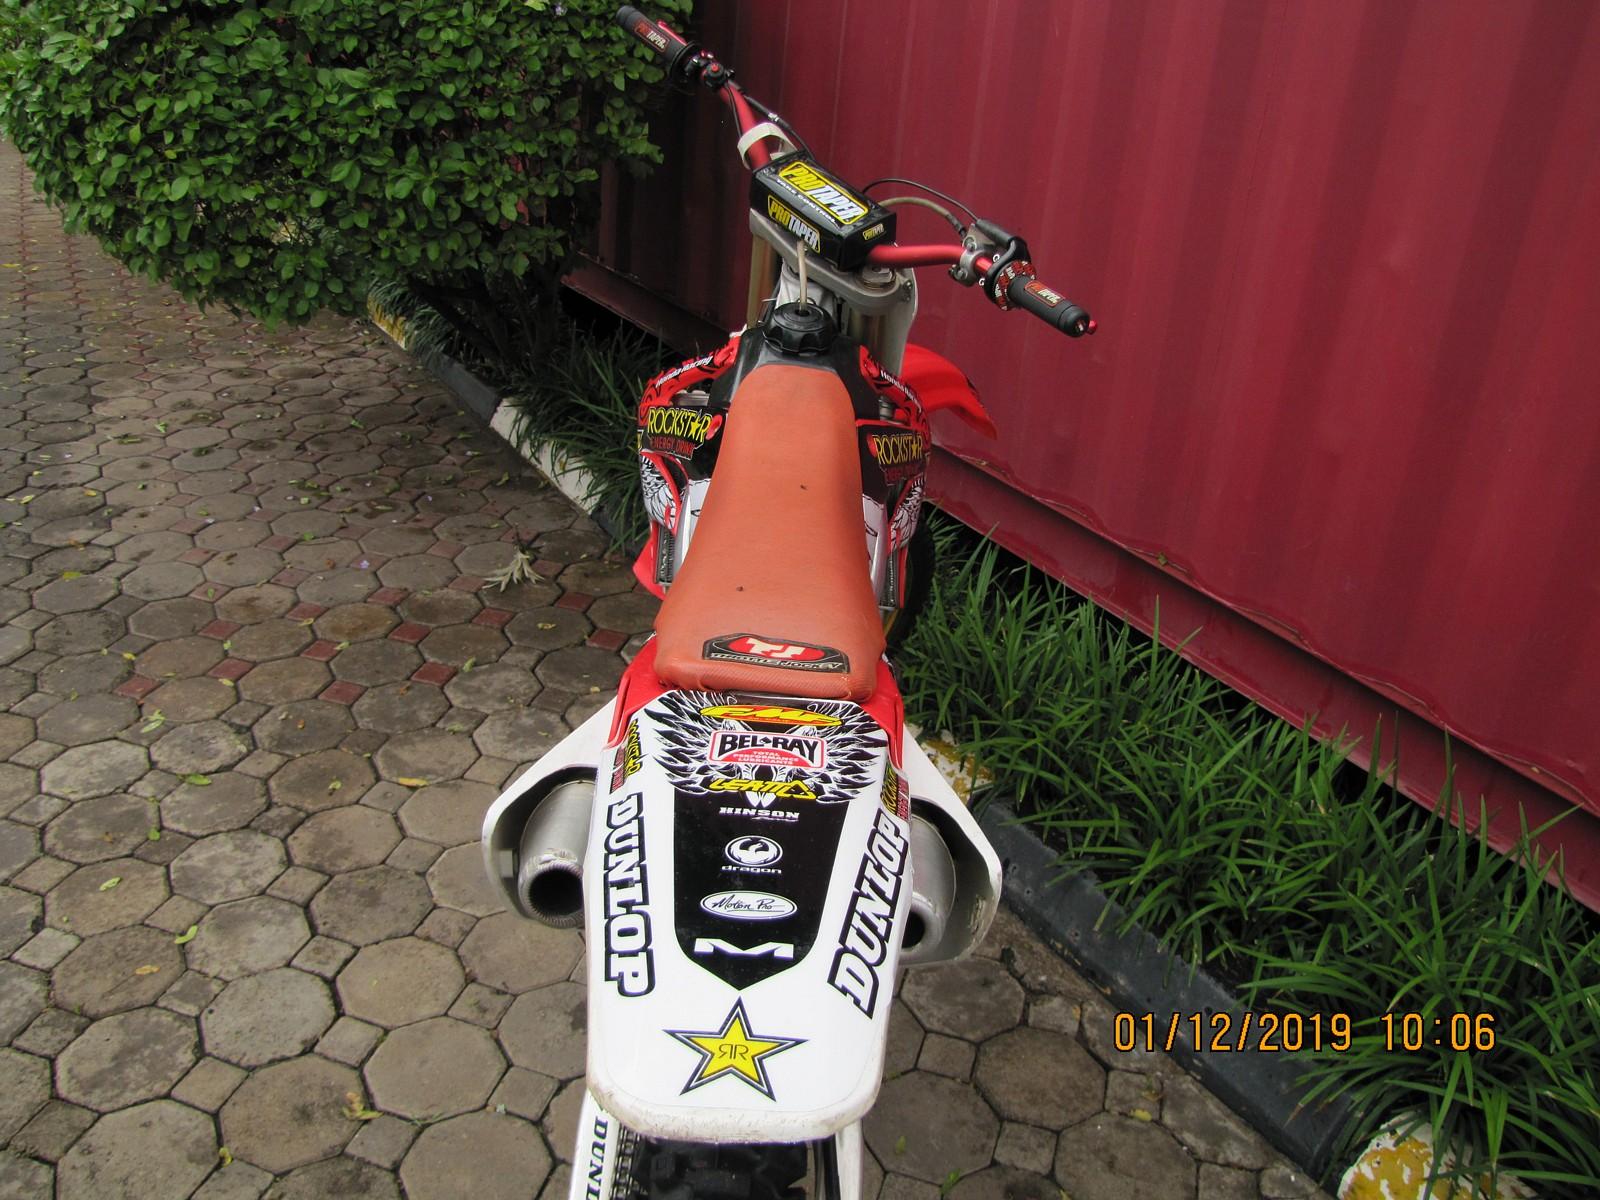 IMG 0030 - banny wailer - Motocross Pictures - Vital MX